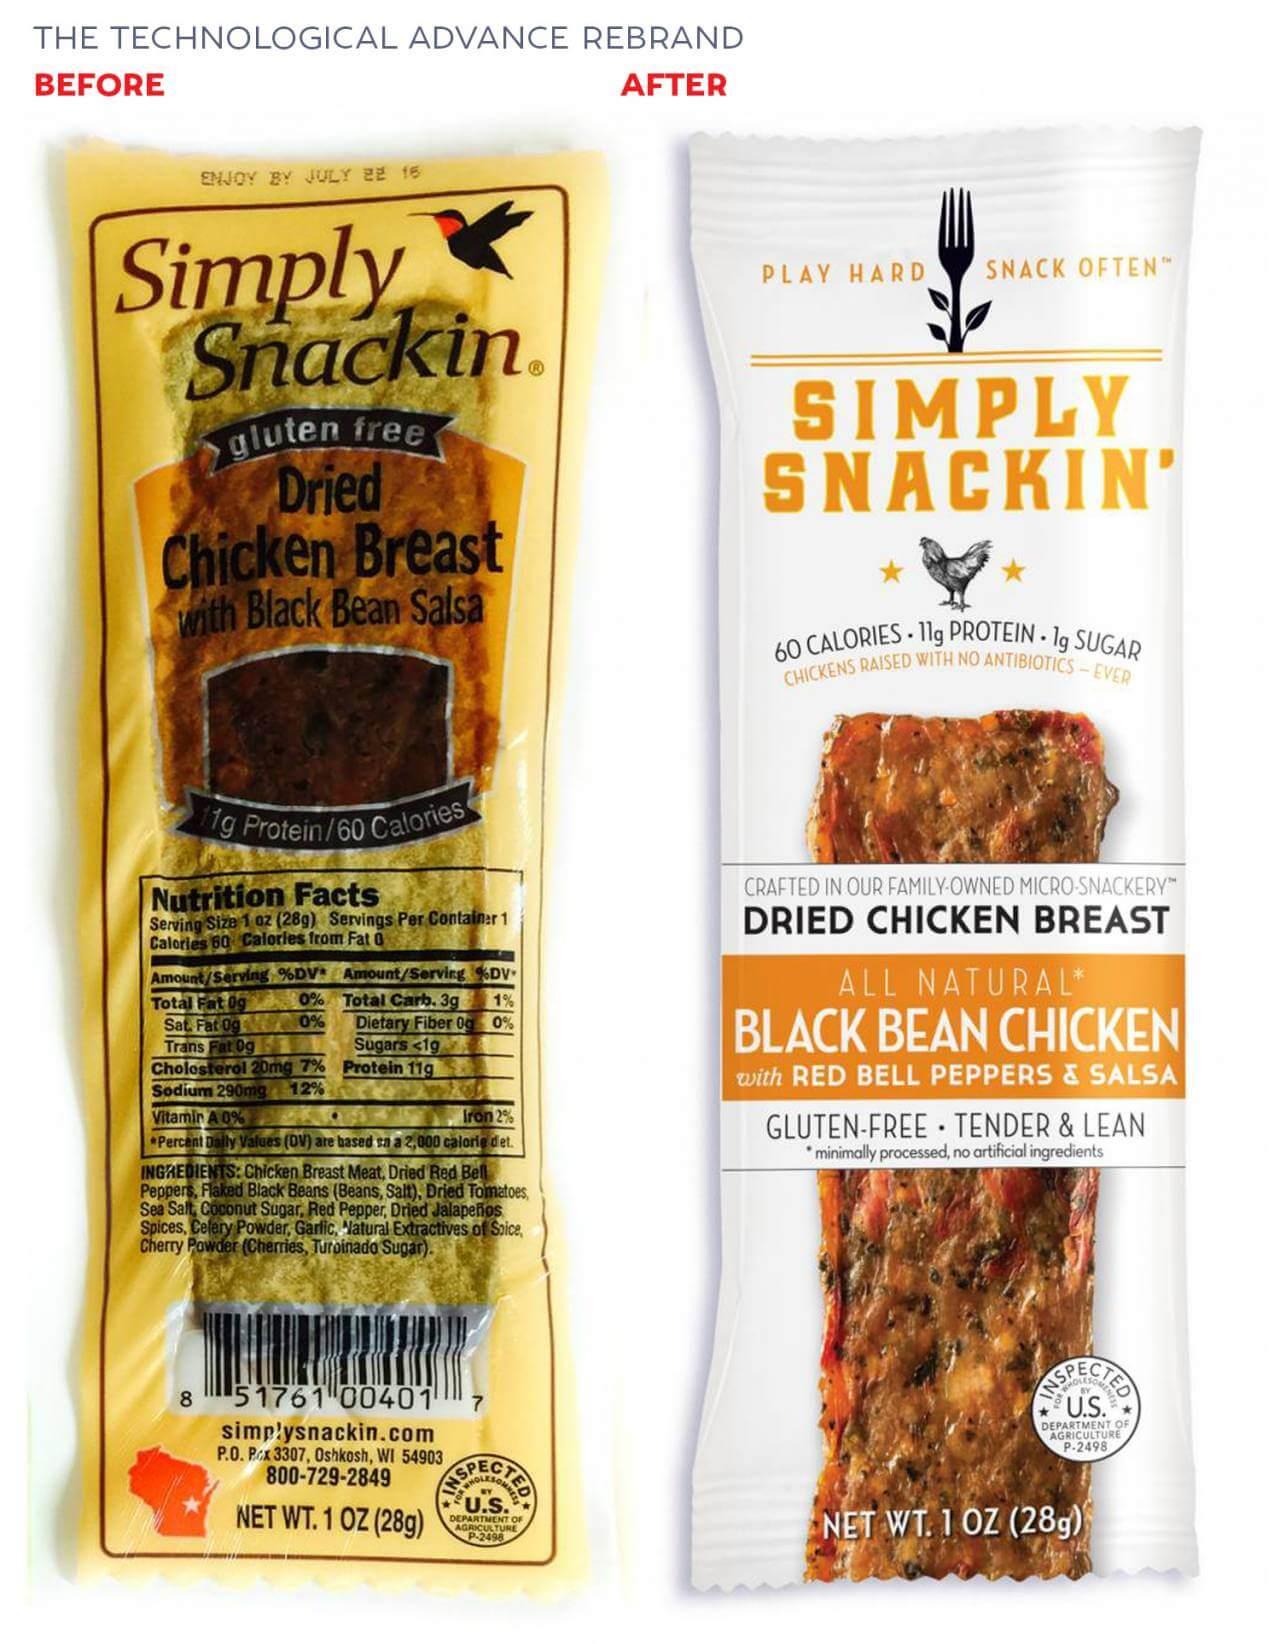 rebranding simply snacking' brand identity